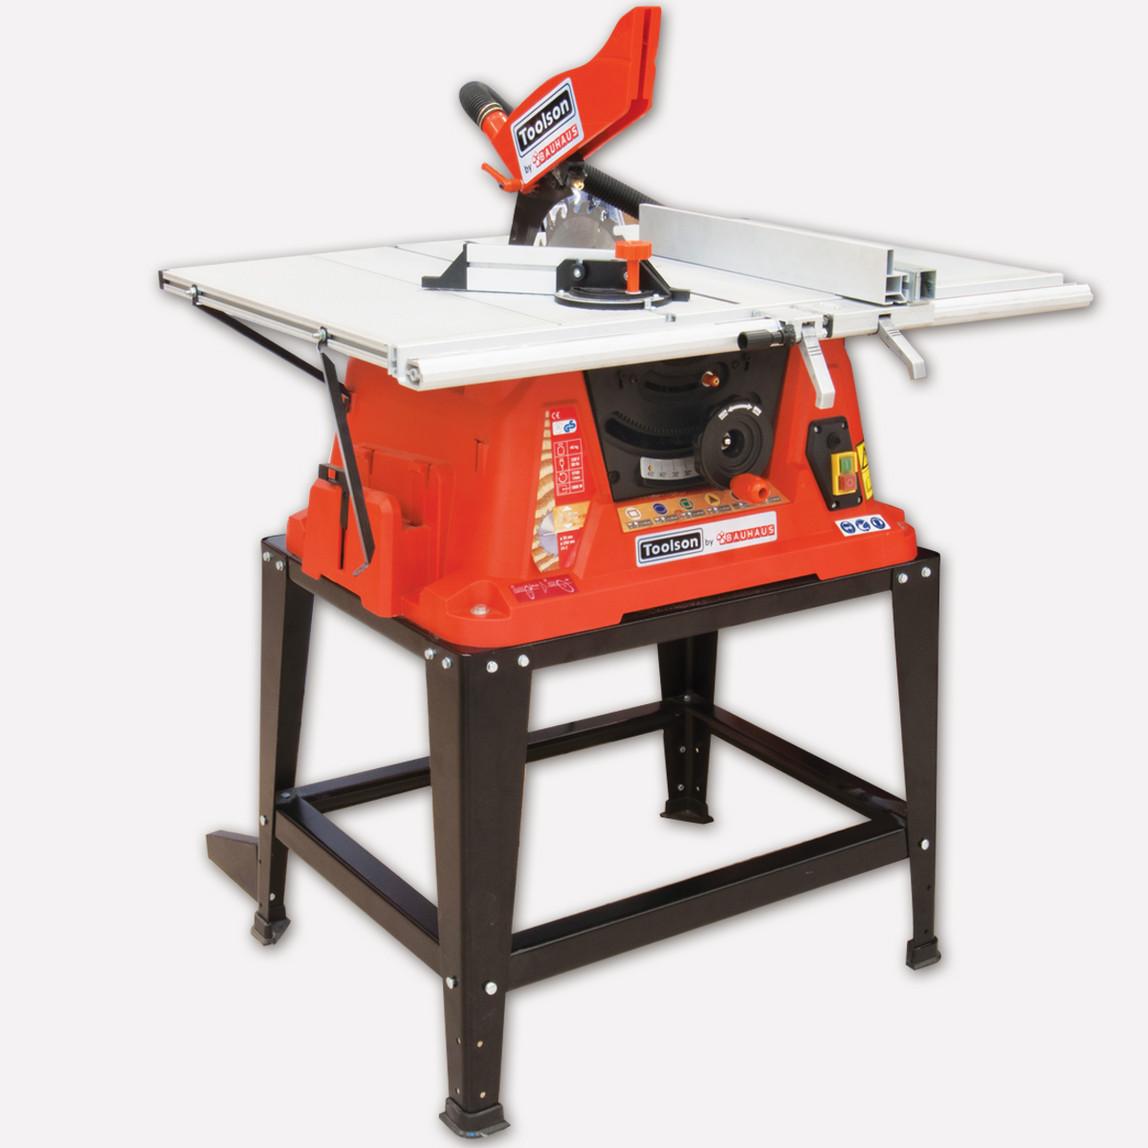 Toolson PRO-TS5000 1800W Lazerli Tezgahlı Daire Testere